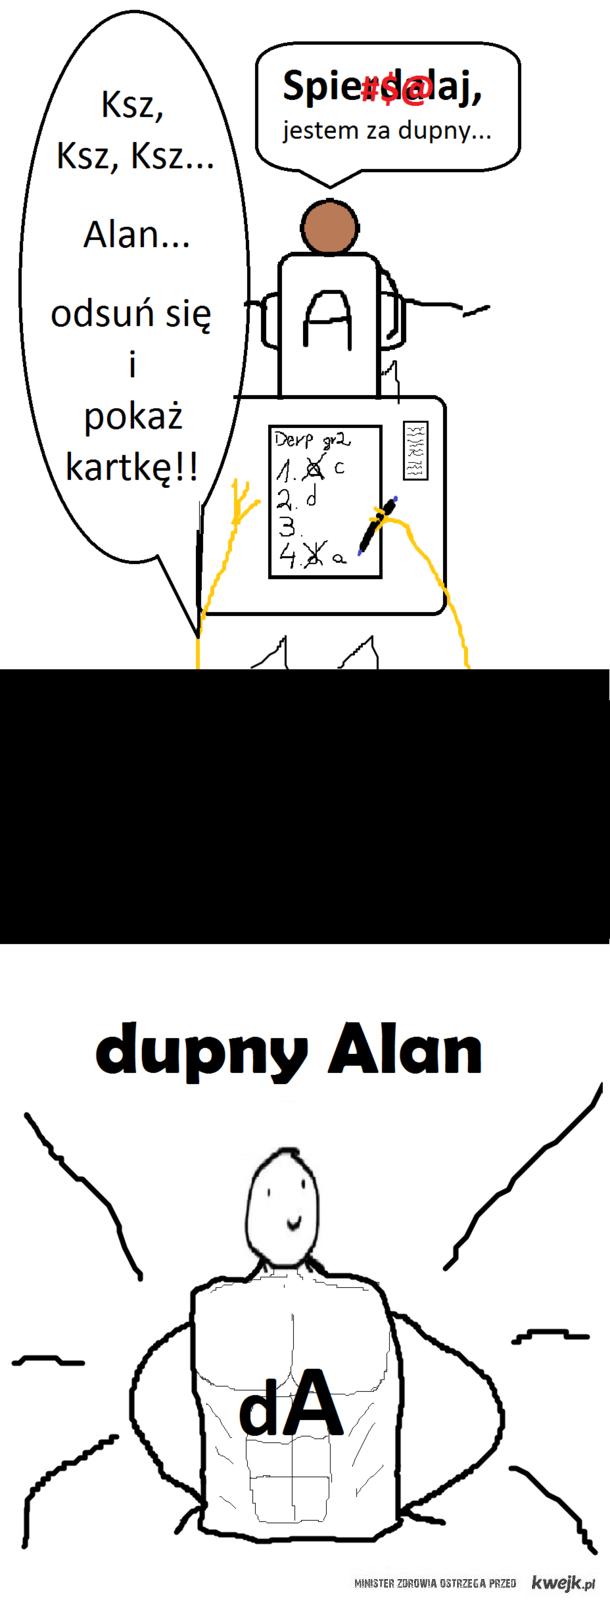 Dupny Alan